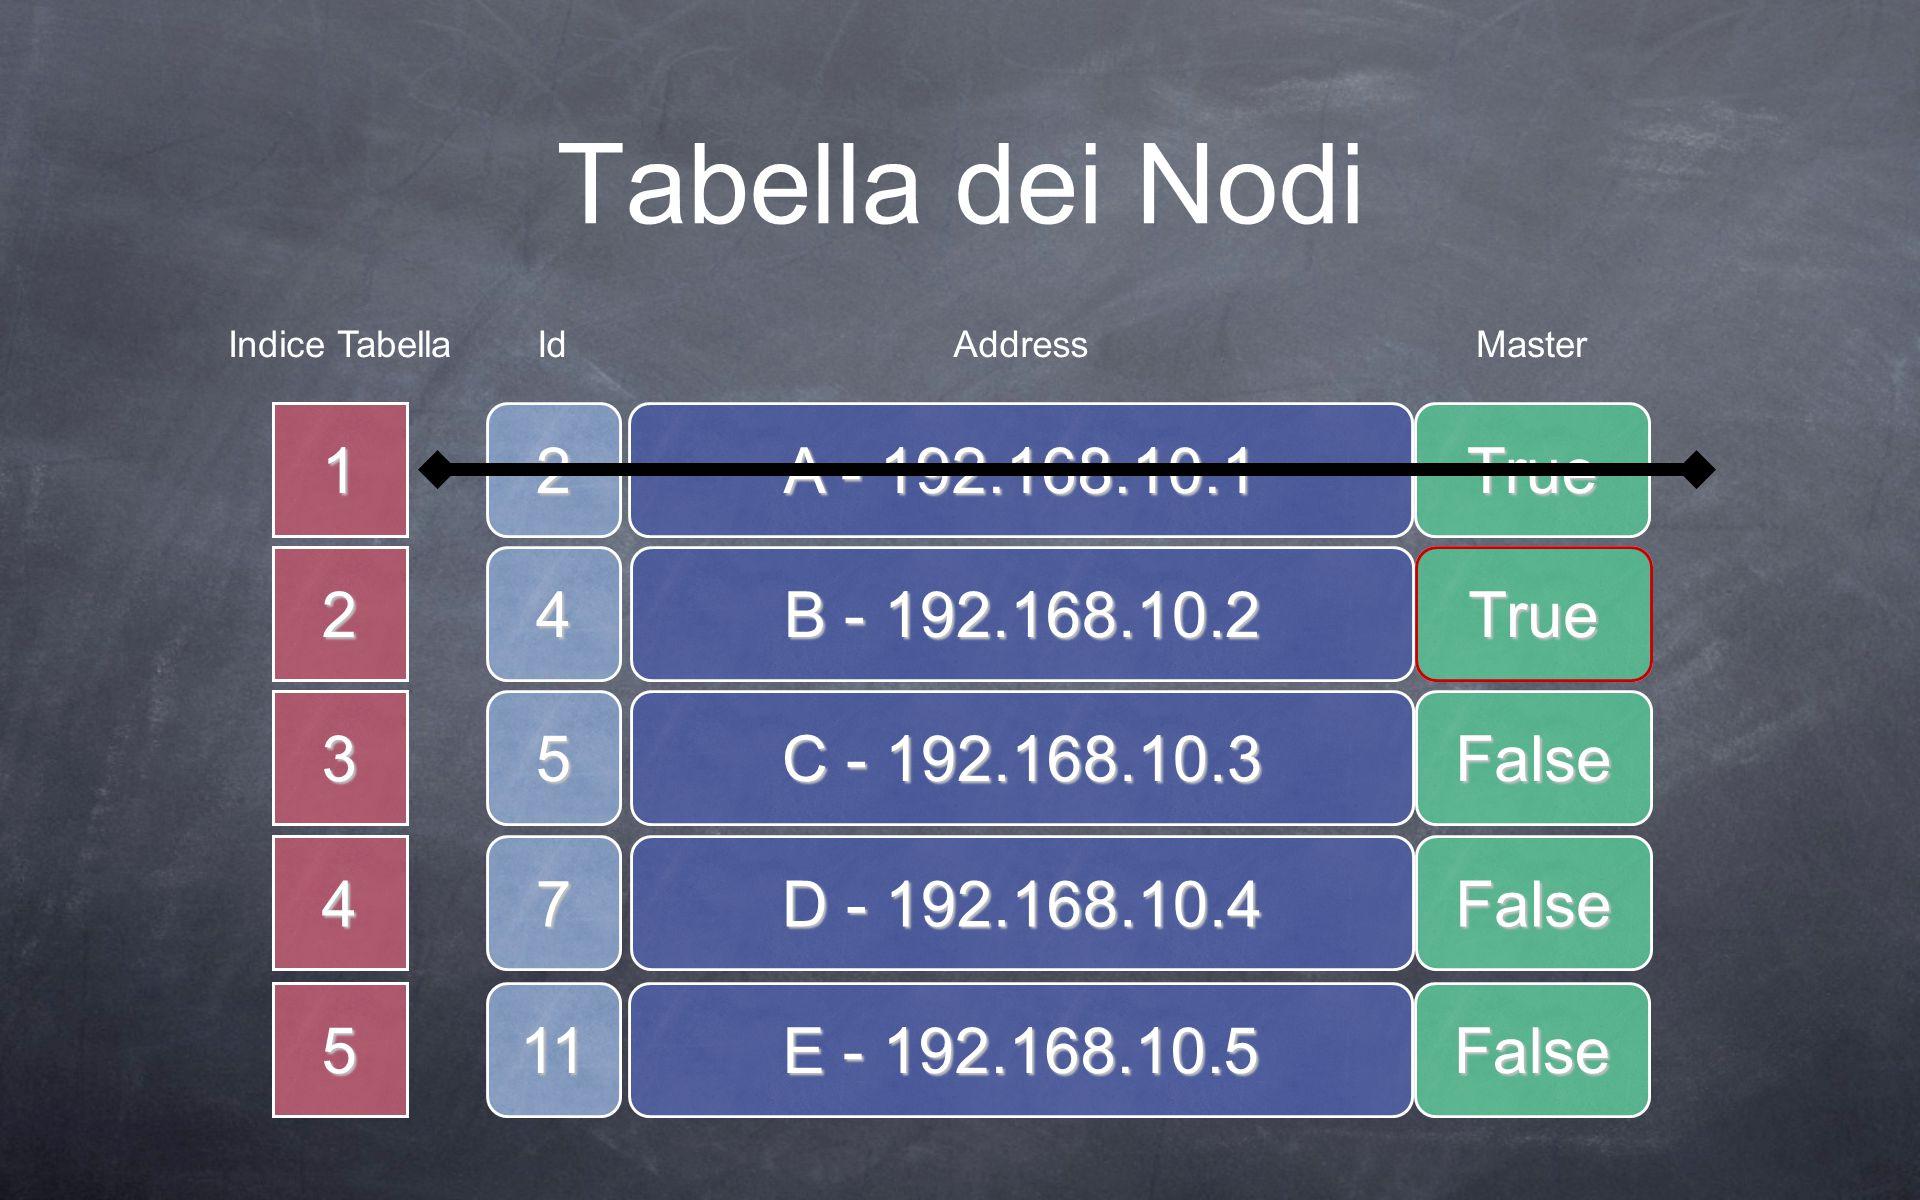 5 4 3 2 Tabella dei Nodi A - 192.168.10.1 1True B - 192.168.10.2 False C - 192.168.10.3 False D - 192.168.10.4 False E - 192.168.10.5 False 2 4 5 7 11 Indice TabellaIdAddressMaster True